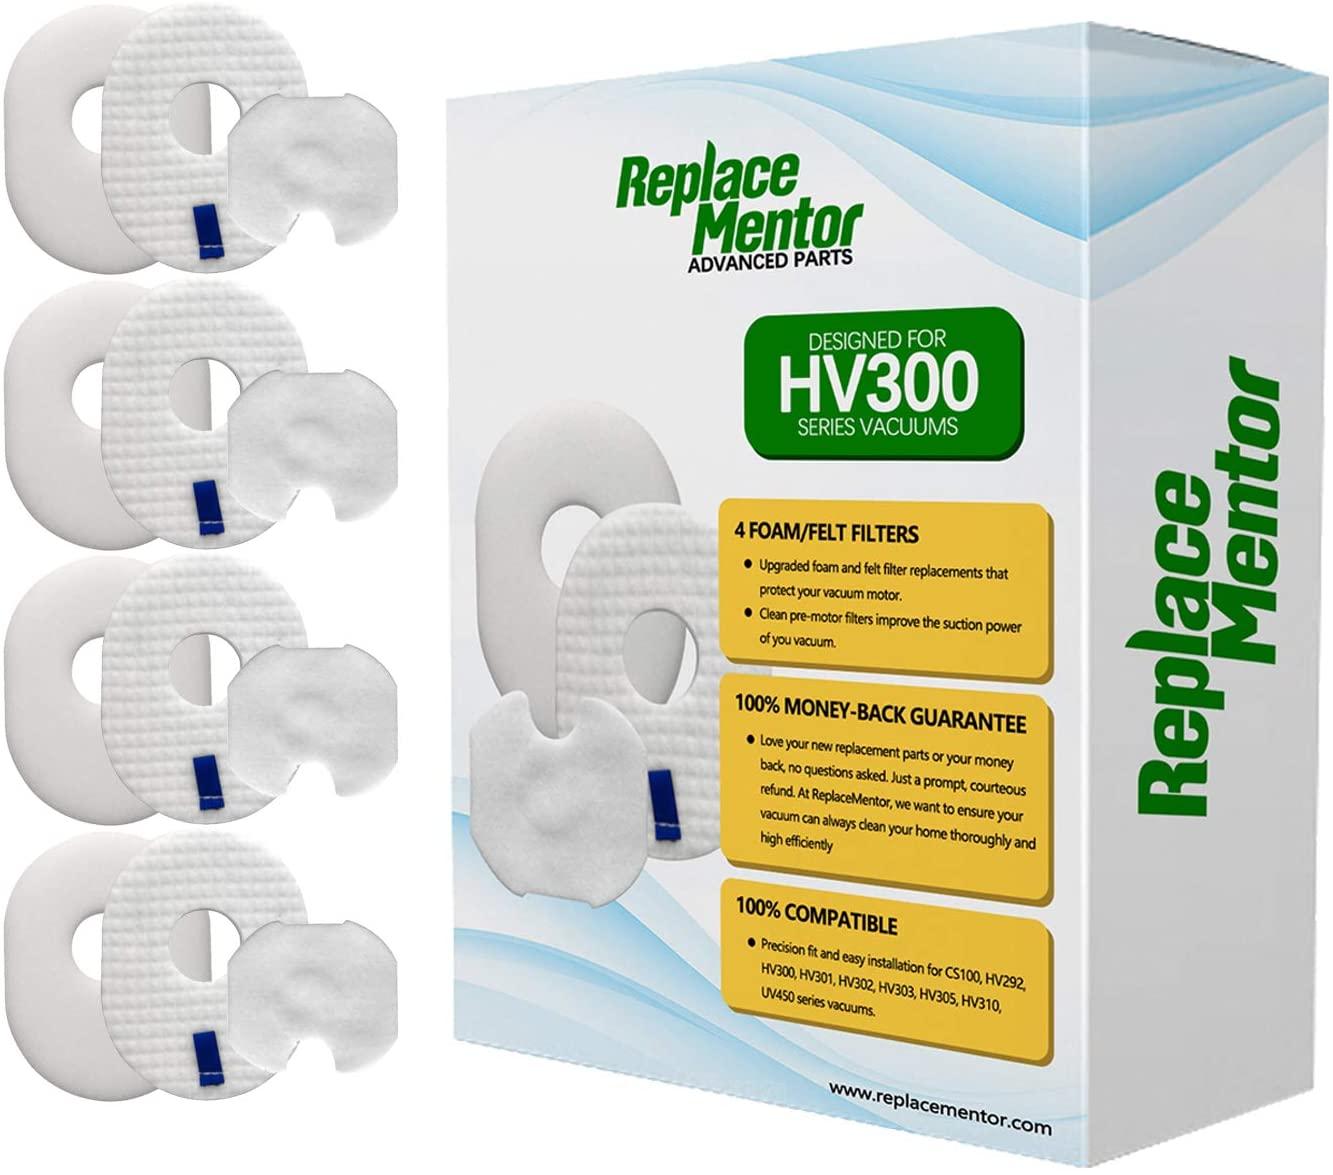 Replace Mentor 4 Allergen Pre-Filter + 4 Post Motor Filter Foam & Felt Replacement Filters for Shark Rocket Vacuum HV292, HV300, HV300W, HV301, HV302, HV303, HV305, HV310, UV450, CS100 Part # XFFV300